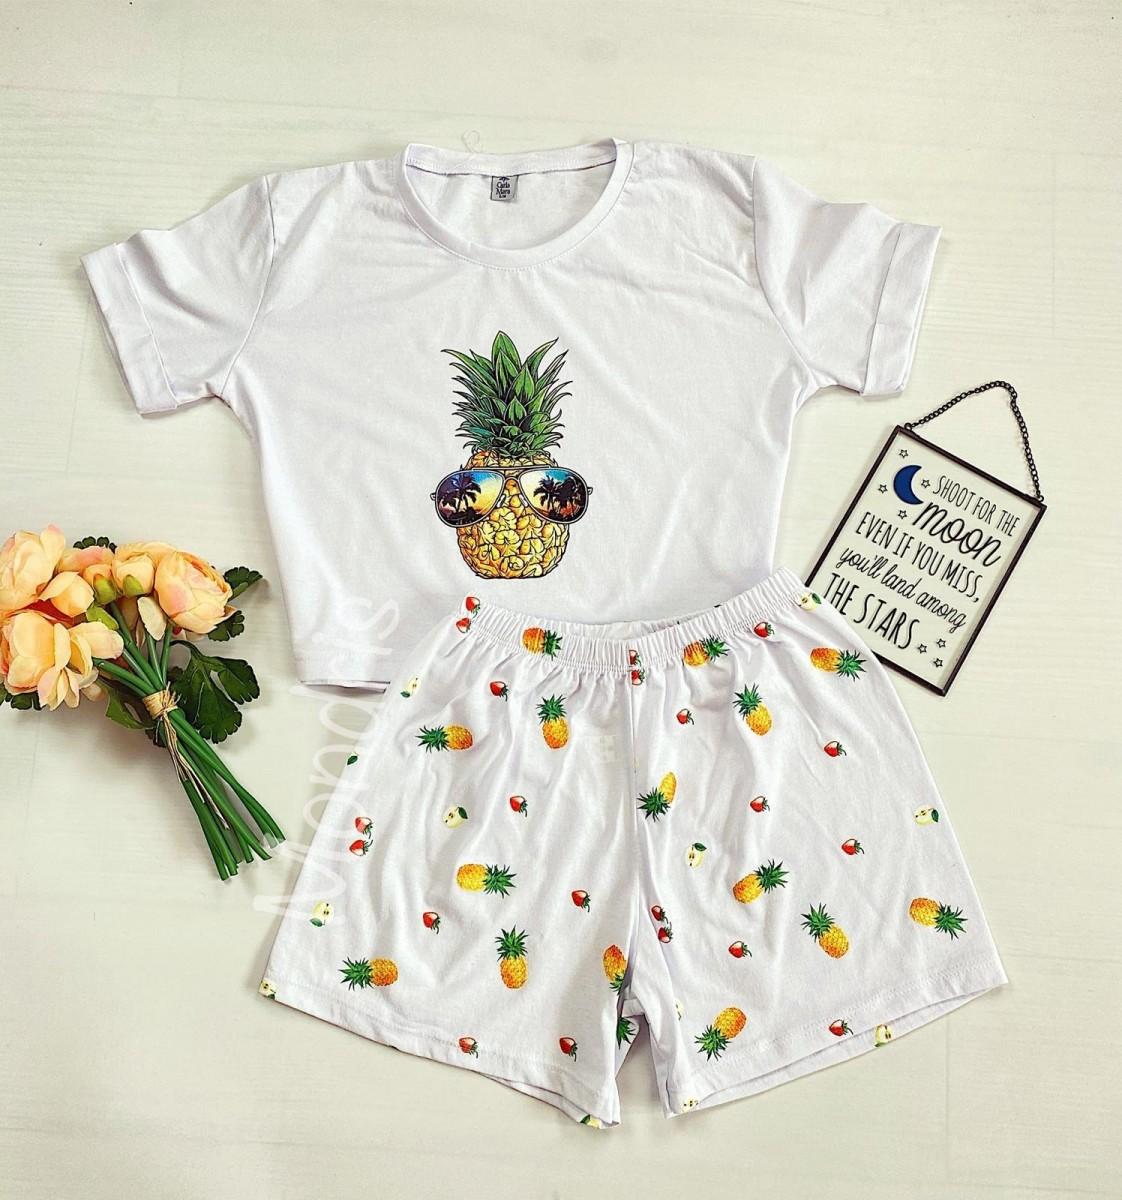 Pijama dama alba ieftina scurta cu tricou trendy si imprimeu ananas